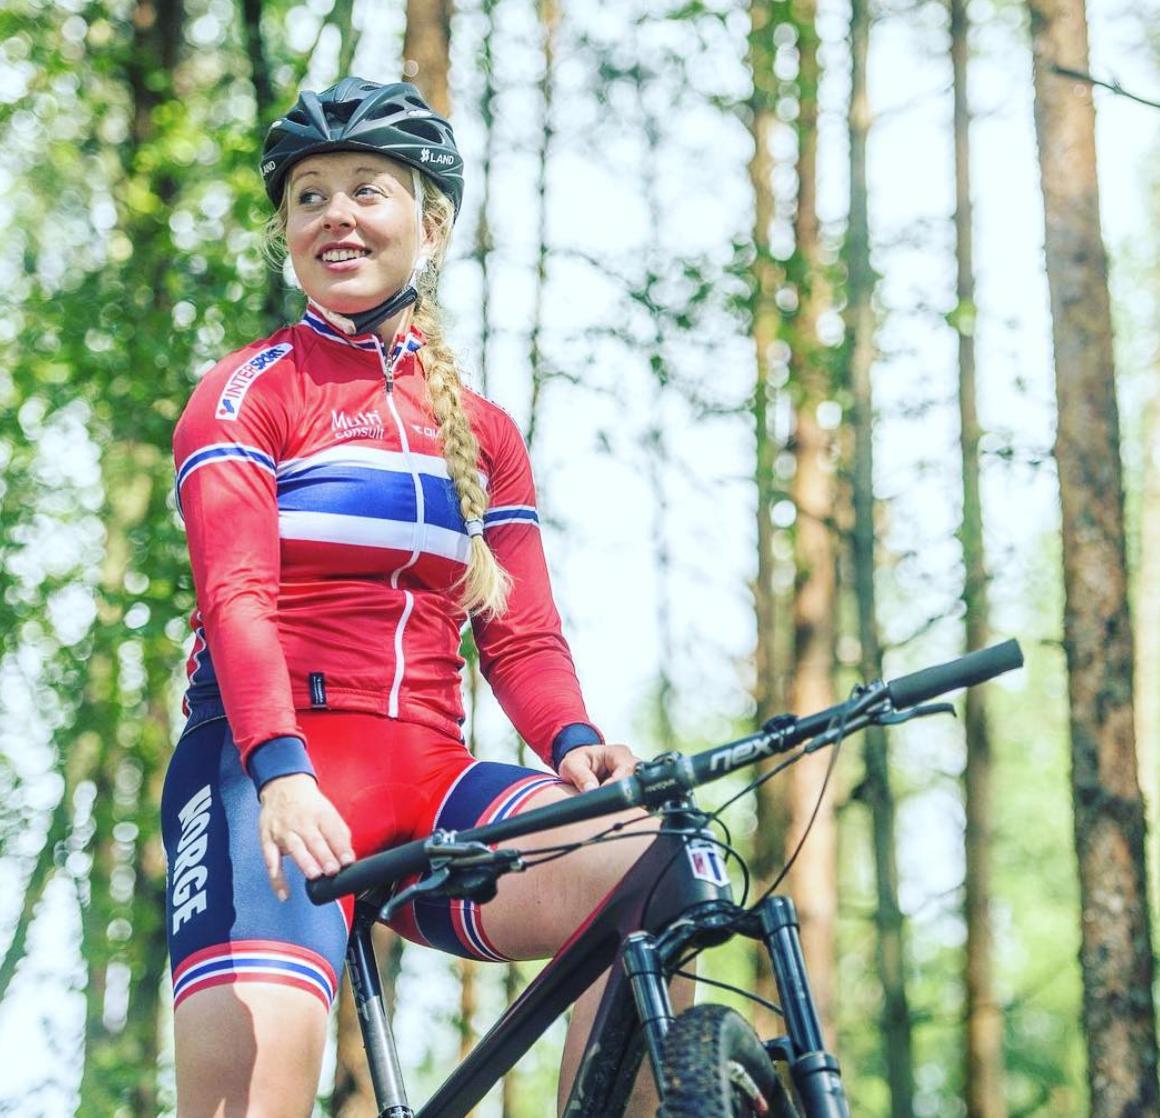 Terrengsprint - Derfor vant Ingrid S. Jacobsen verdenscupen